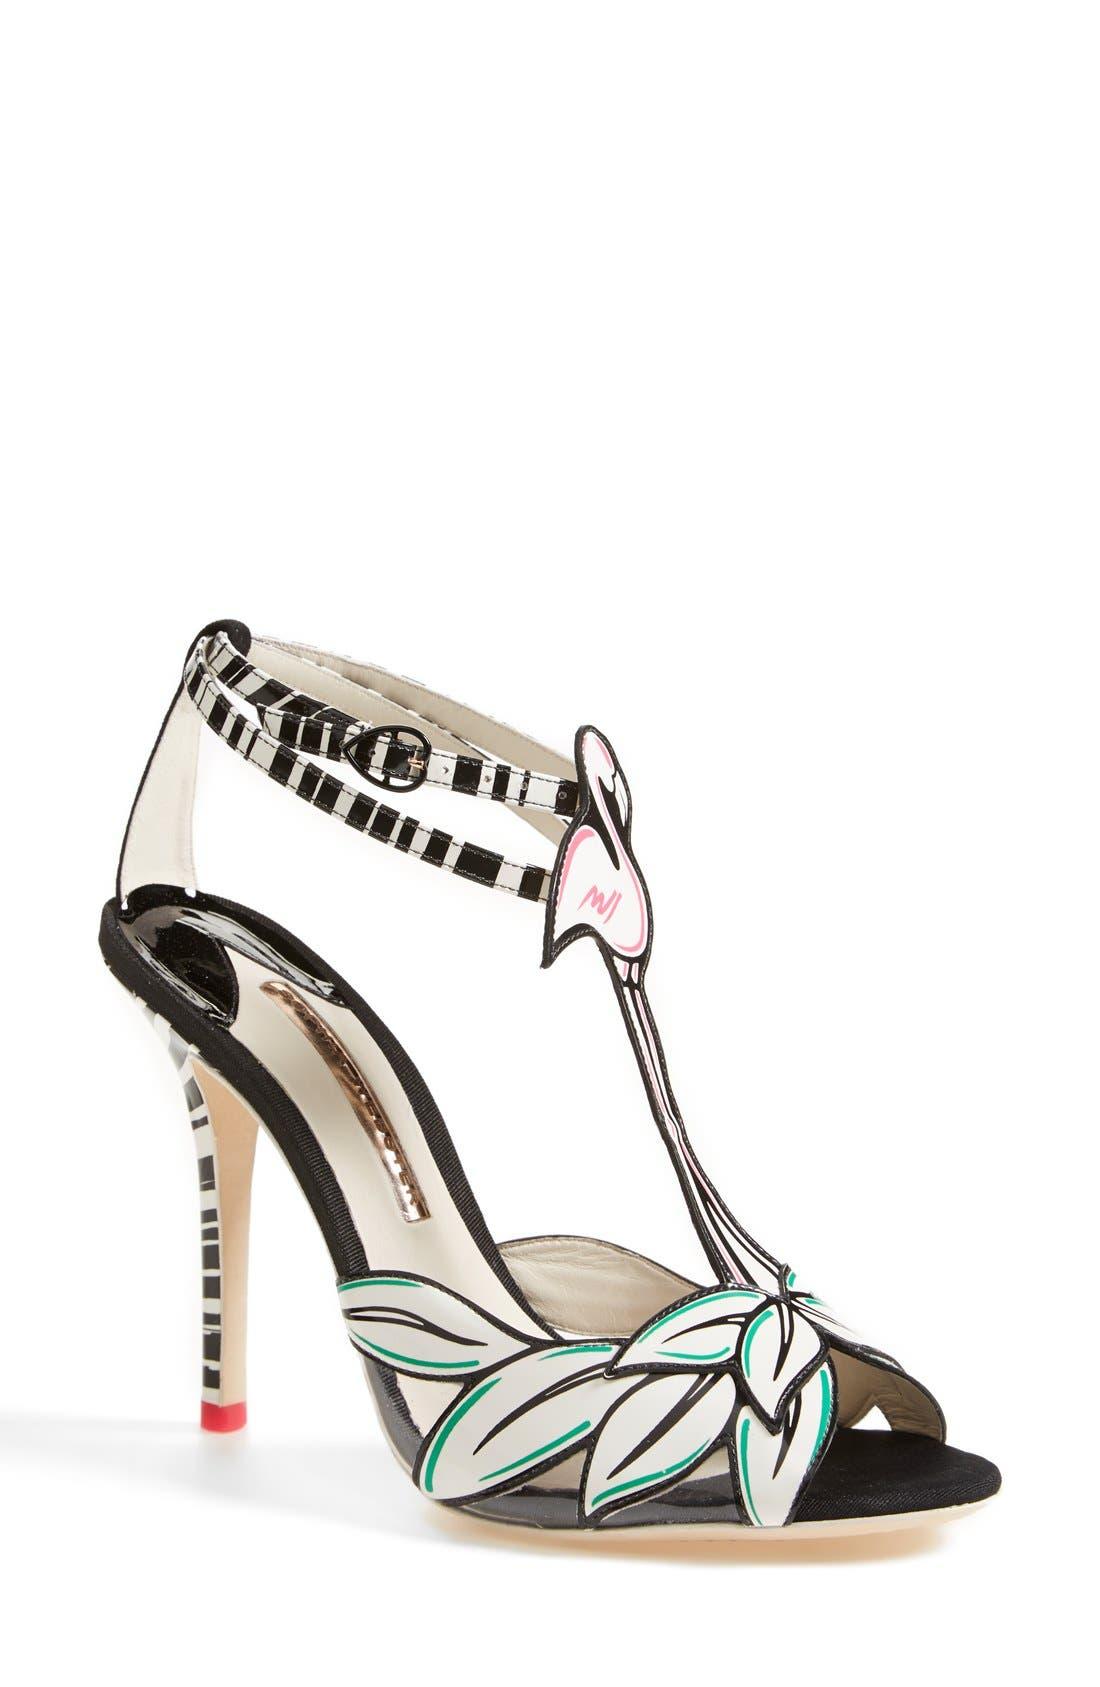 Main Image - Sophia Webster 'Flamingo' T-Strap Leather Sandal (Women)